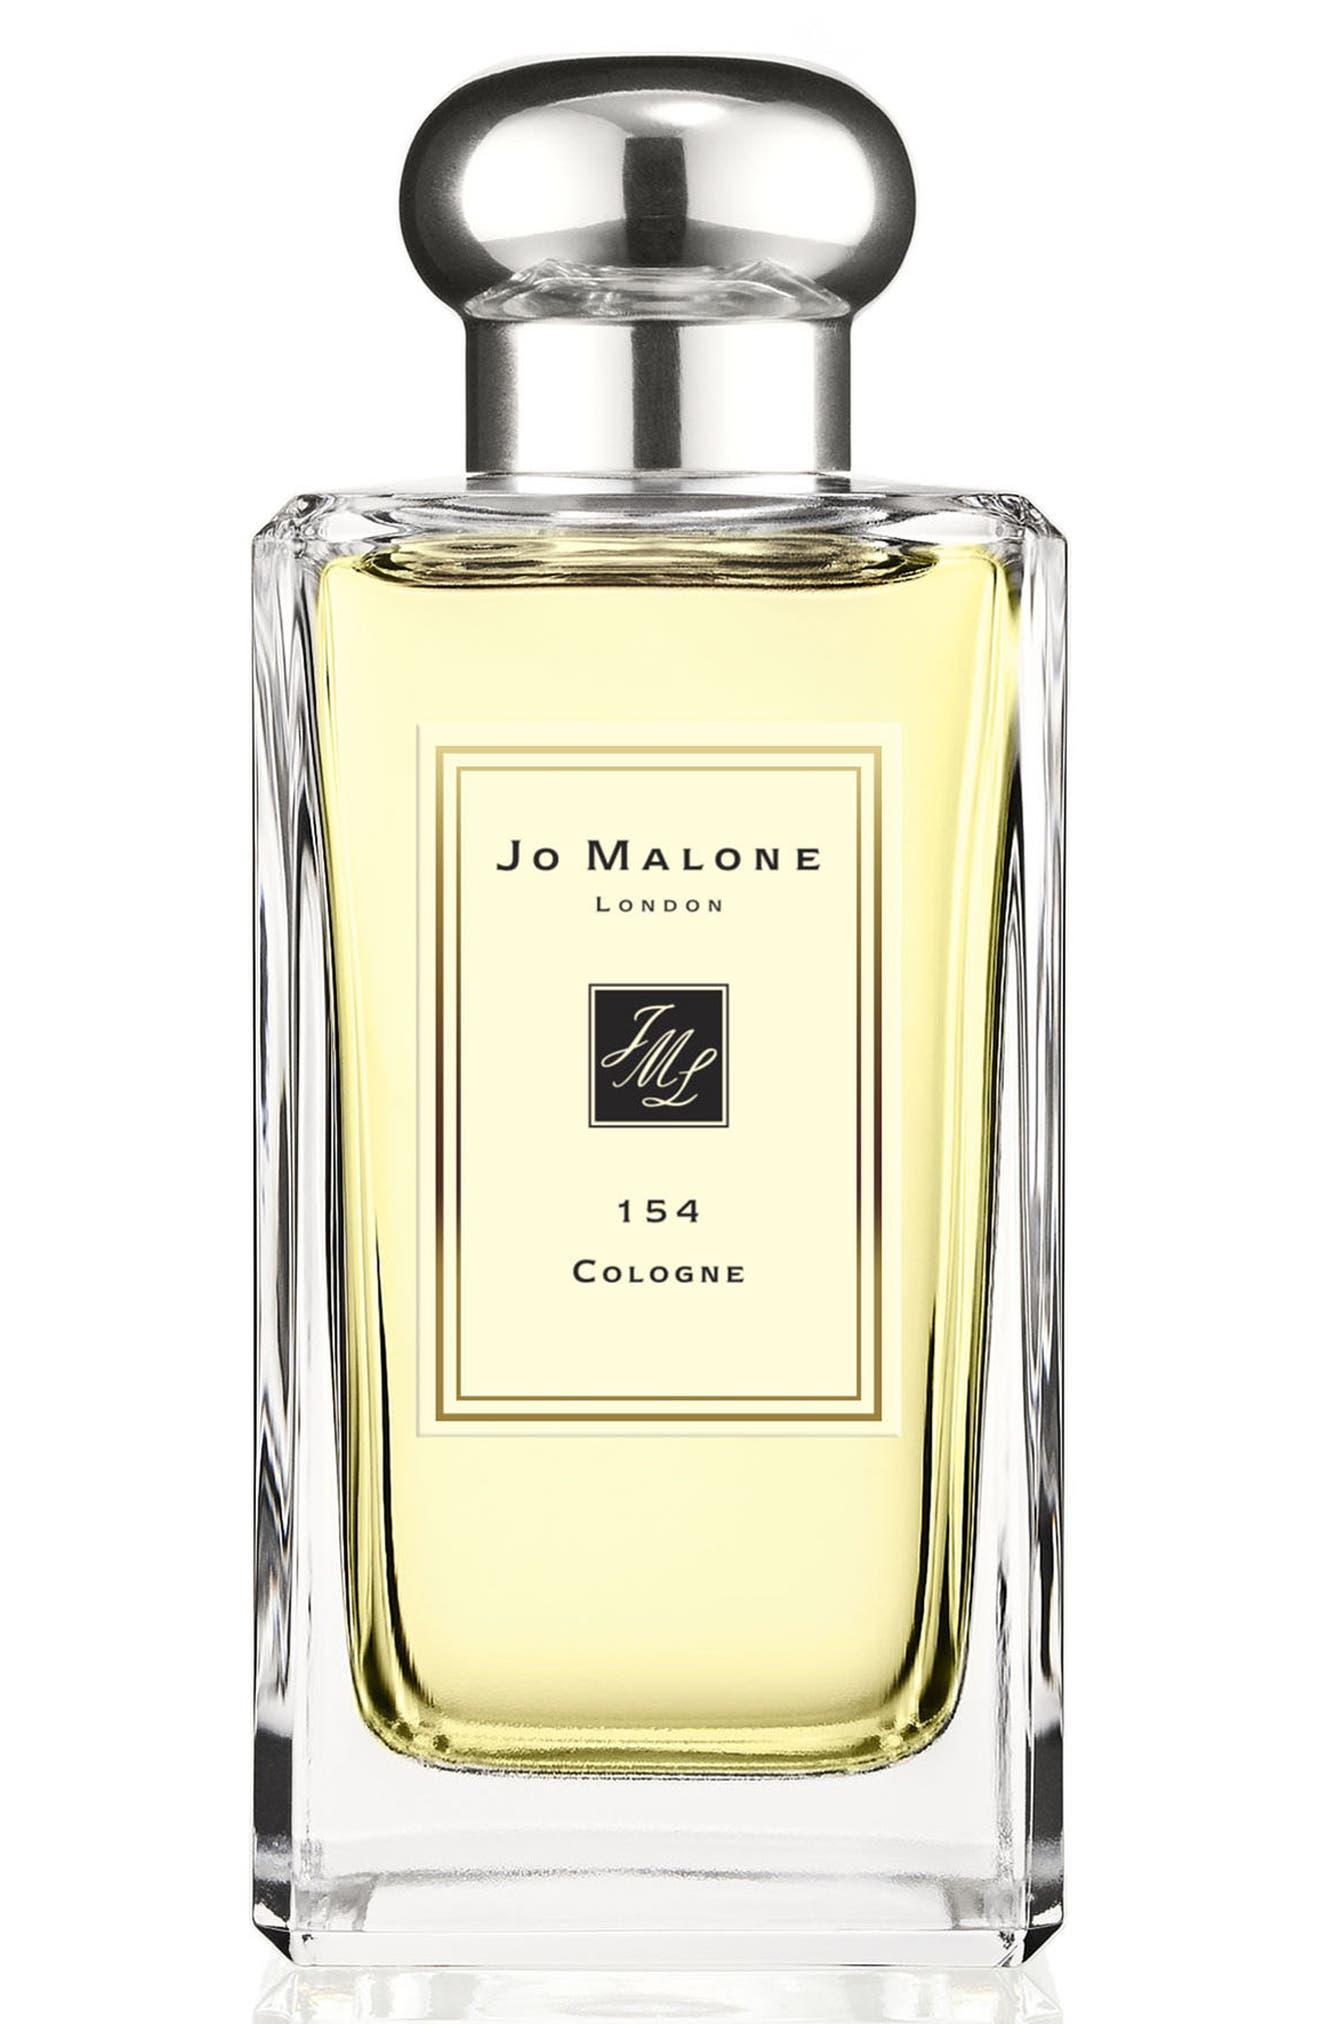 Jo Malone London(TM) 154 Cologne